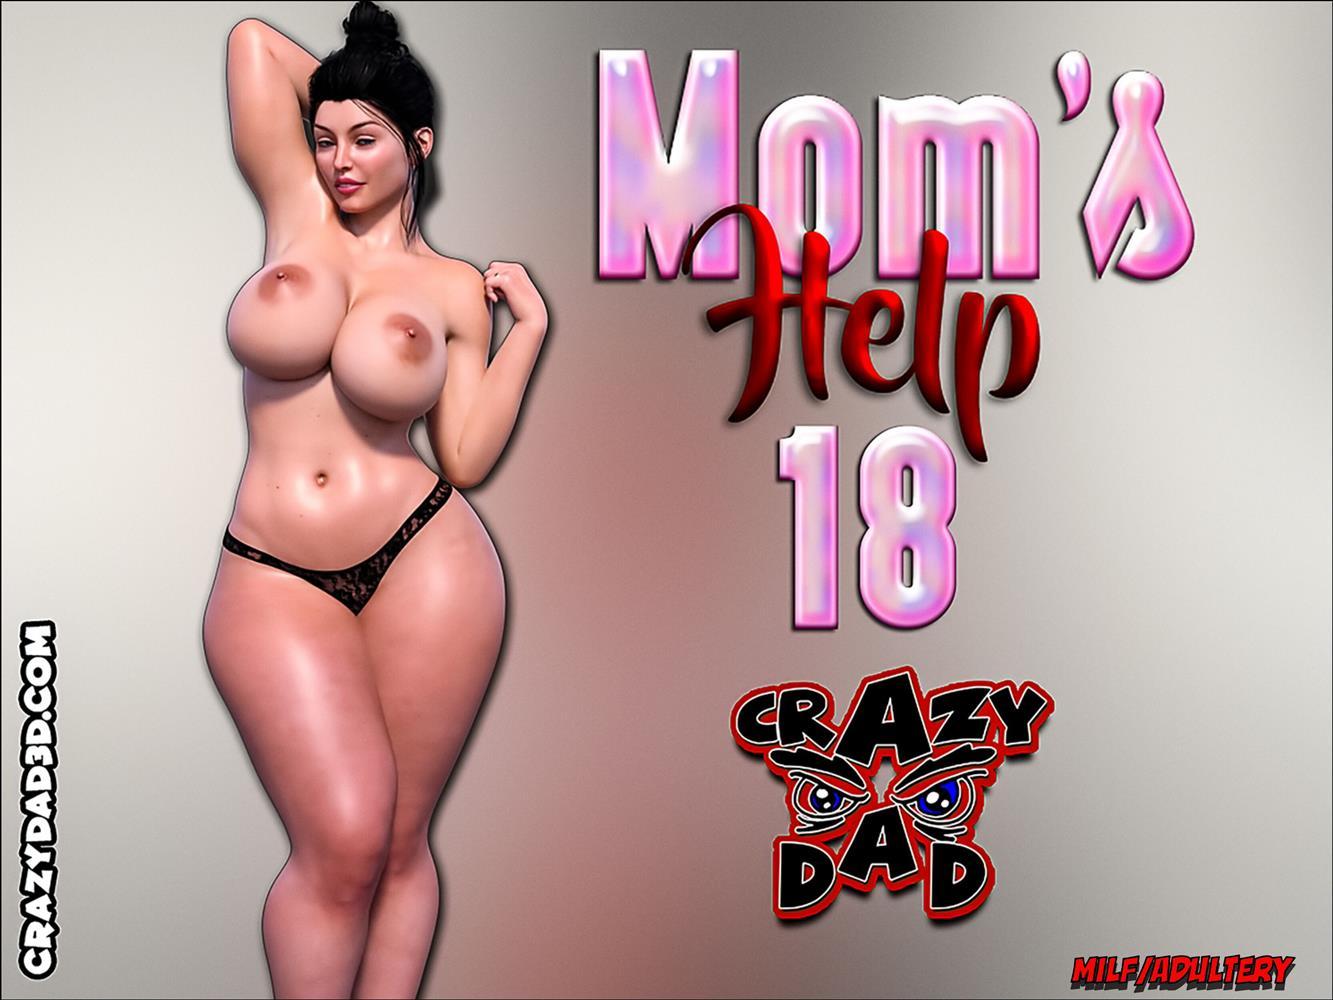 Mom's Help 18 [Crazy Dad 3D] - Foto 1